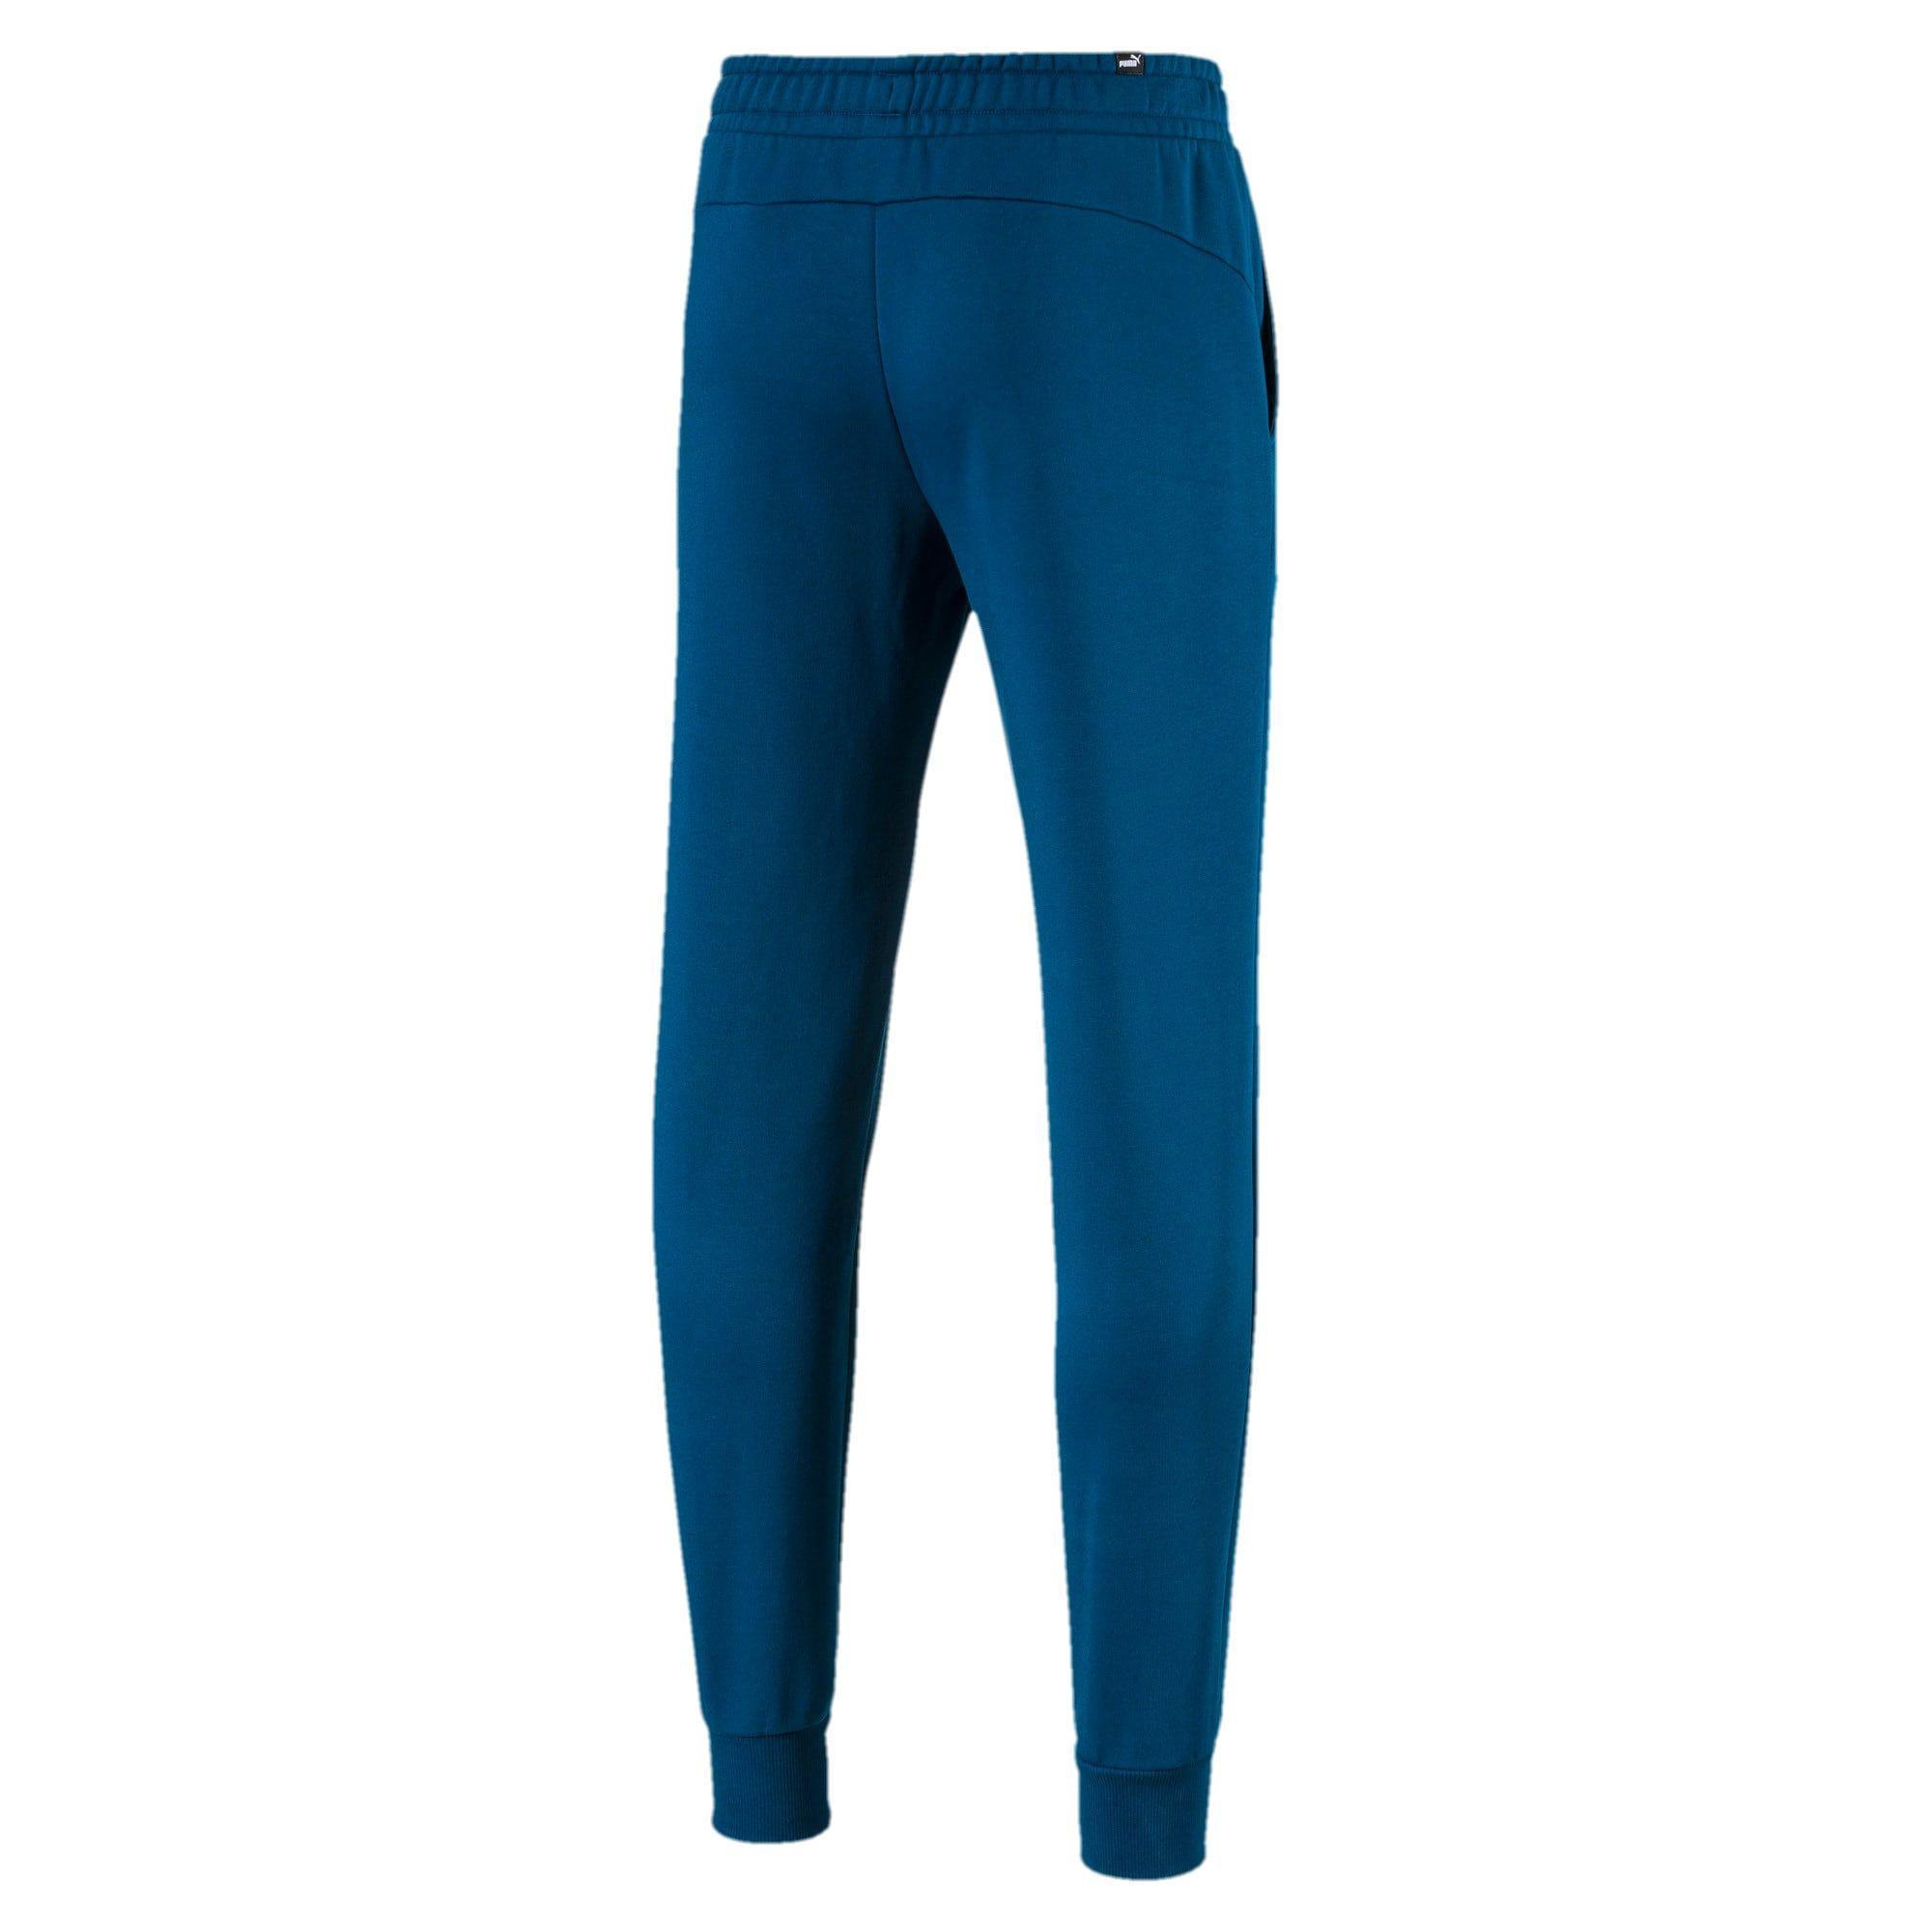 PUMA Essentials Fleece Men's Sweatpants in Gibraltar Sea size 2X Small #sweatpantsoutfit